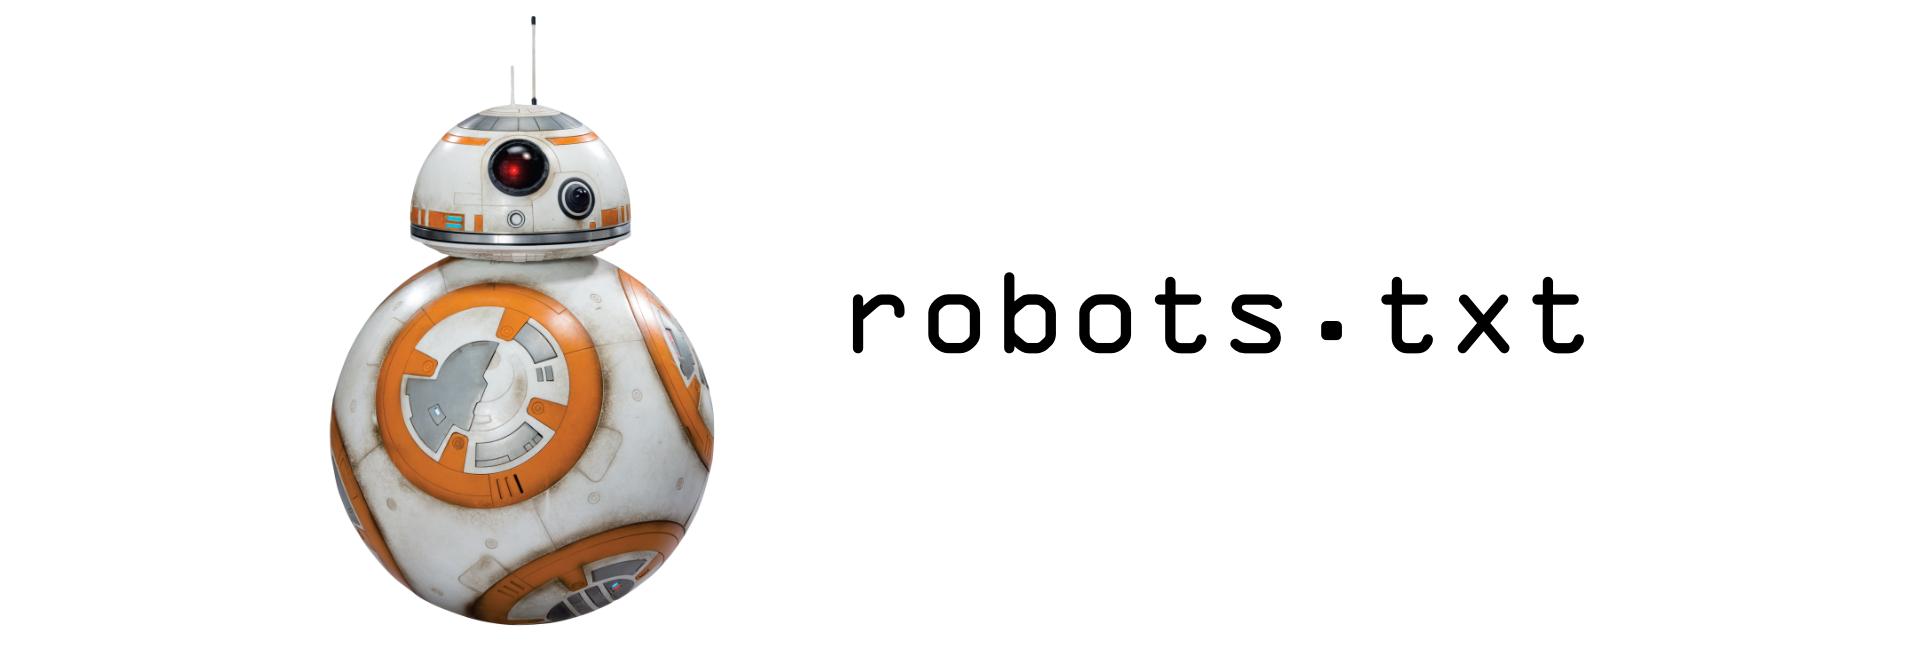 Robots Txt Hero Image